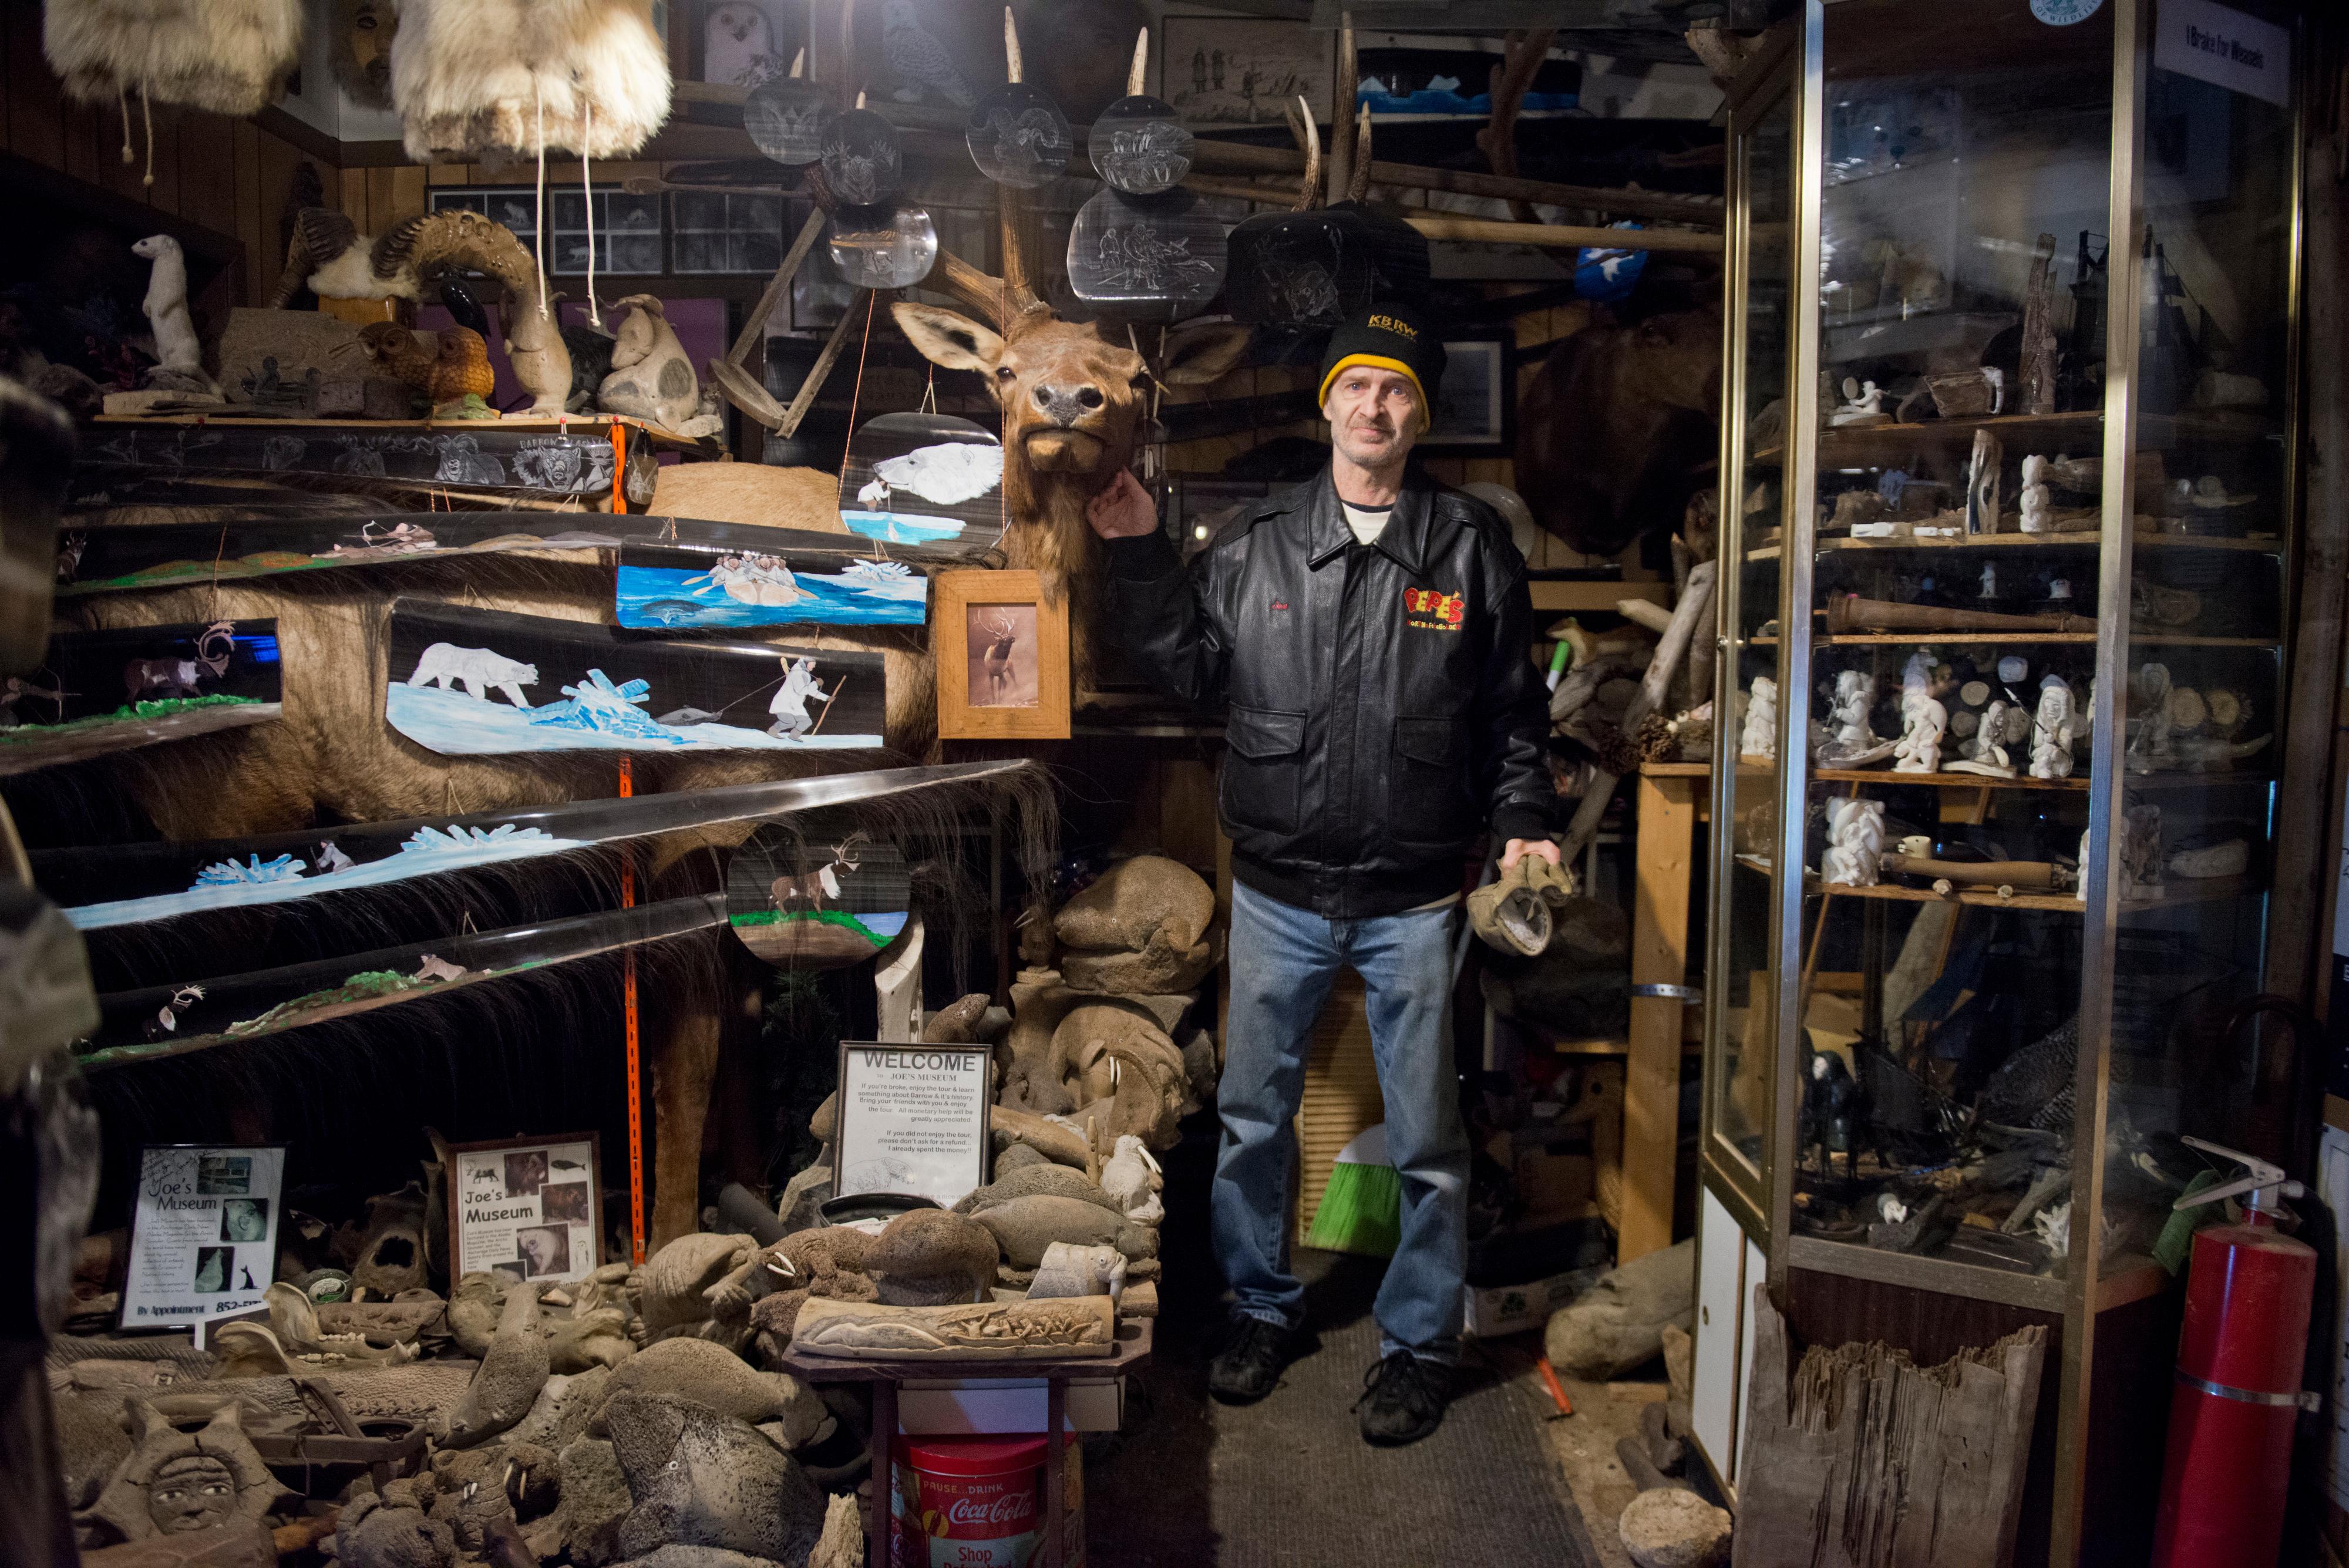 In Utqiagvik, Joe the Waterman made an Alaska museum like no other